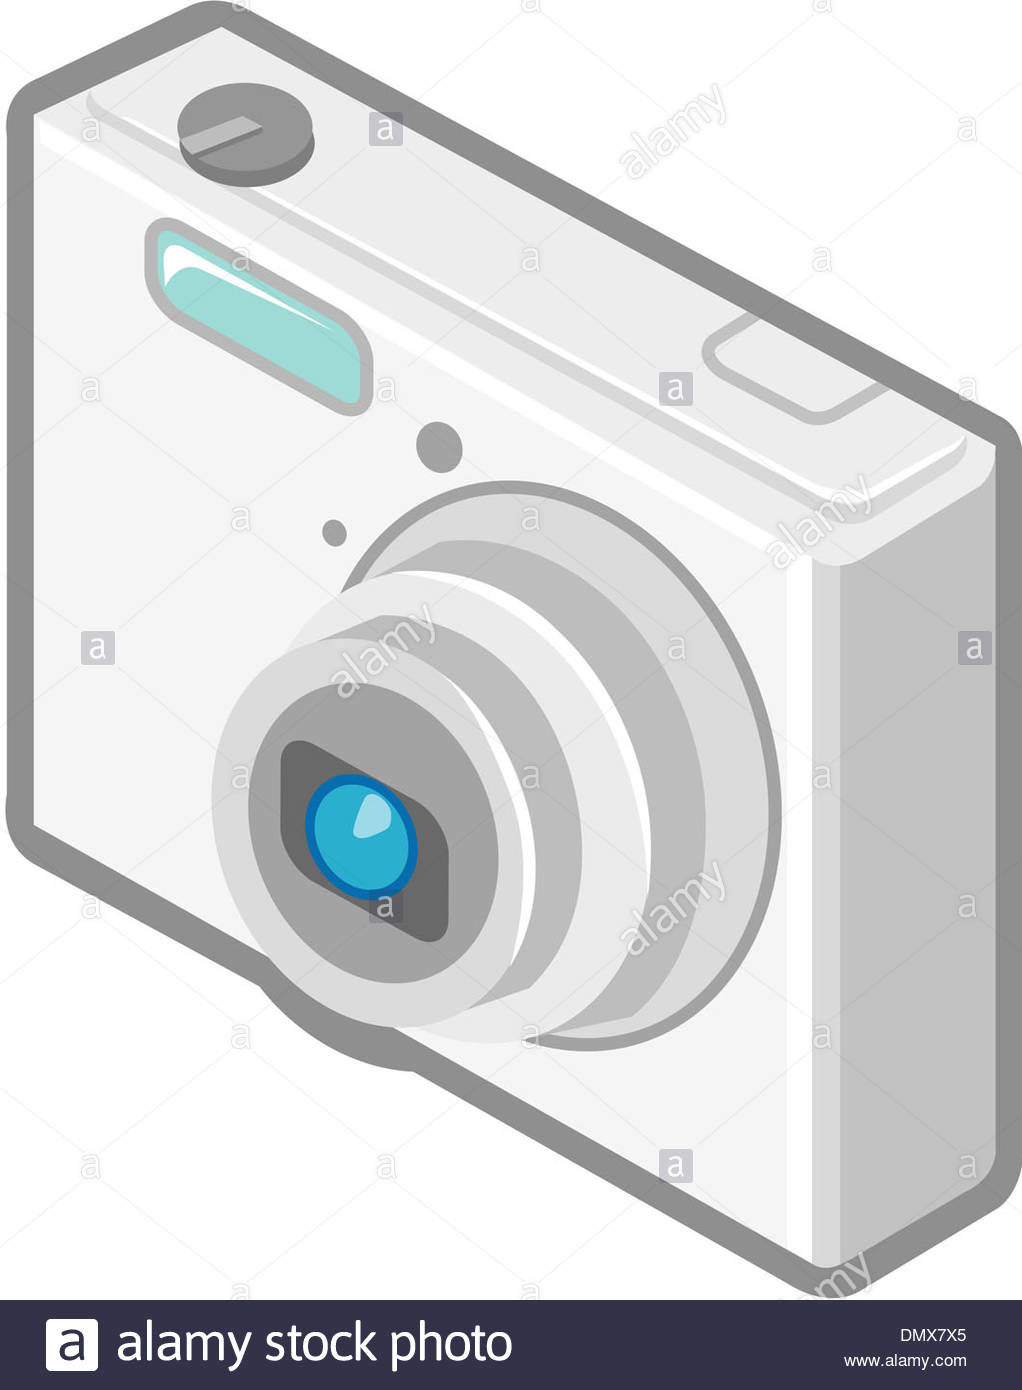 Electric appliance camera digital cameral diagram digital electric appliance camera digital cameral diagram digital camera icon pooptronica